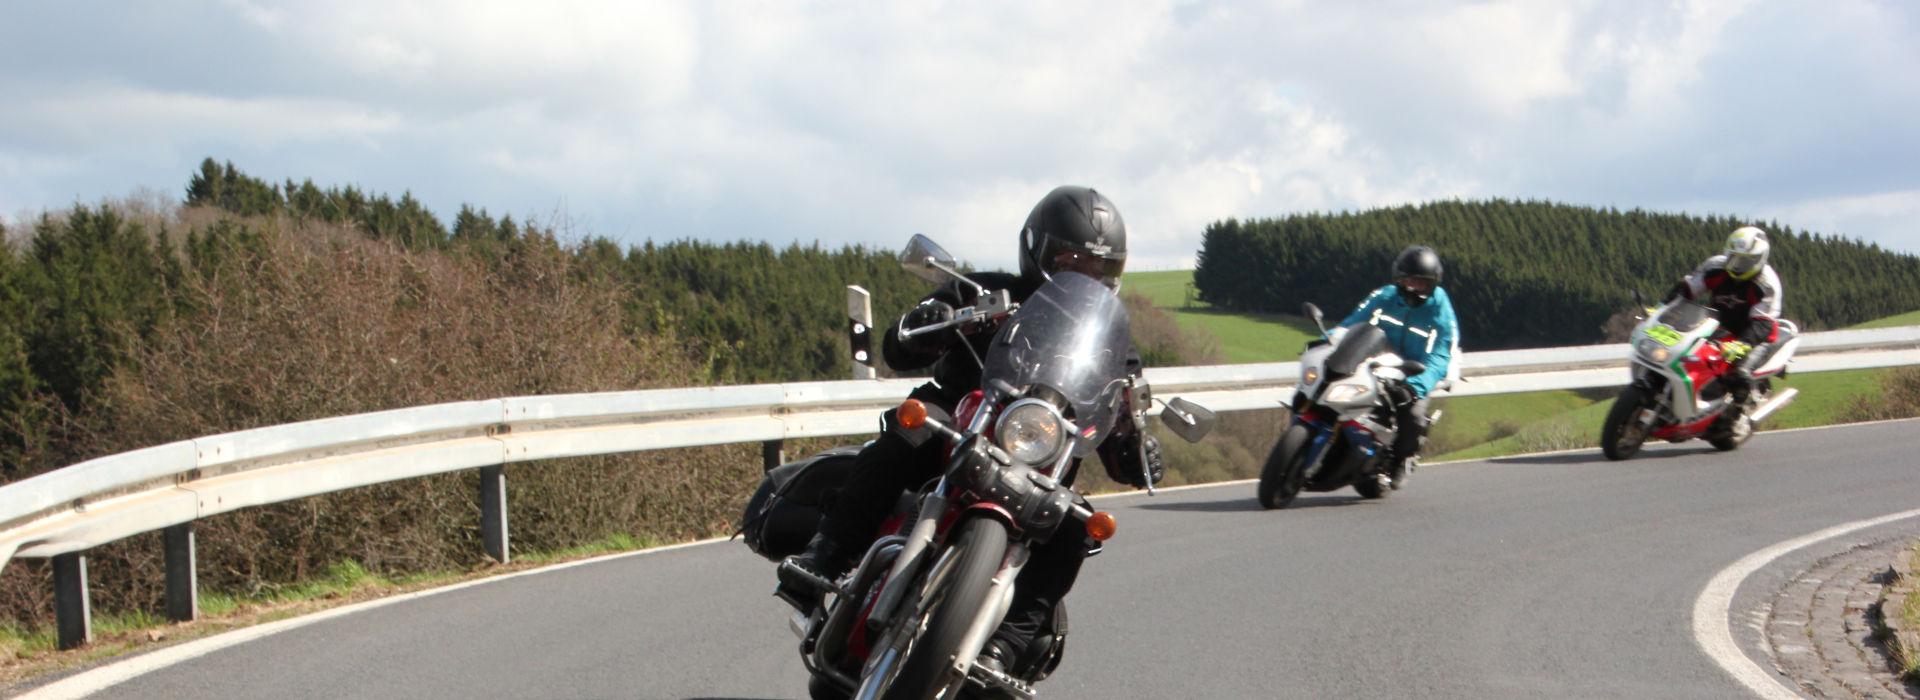 Motorrijbewijspoint Leiderdorp motorexamens AVB en AVD